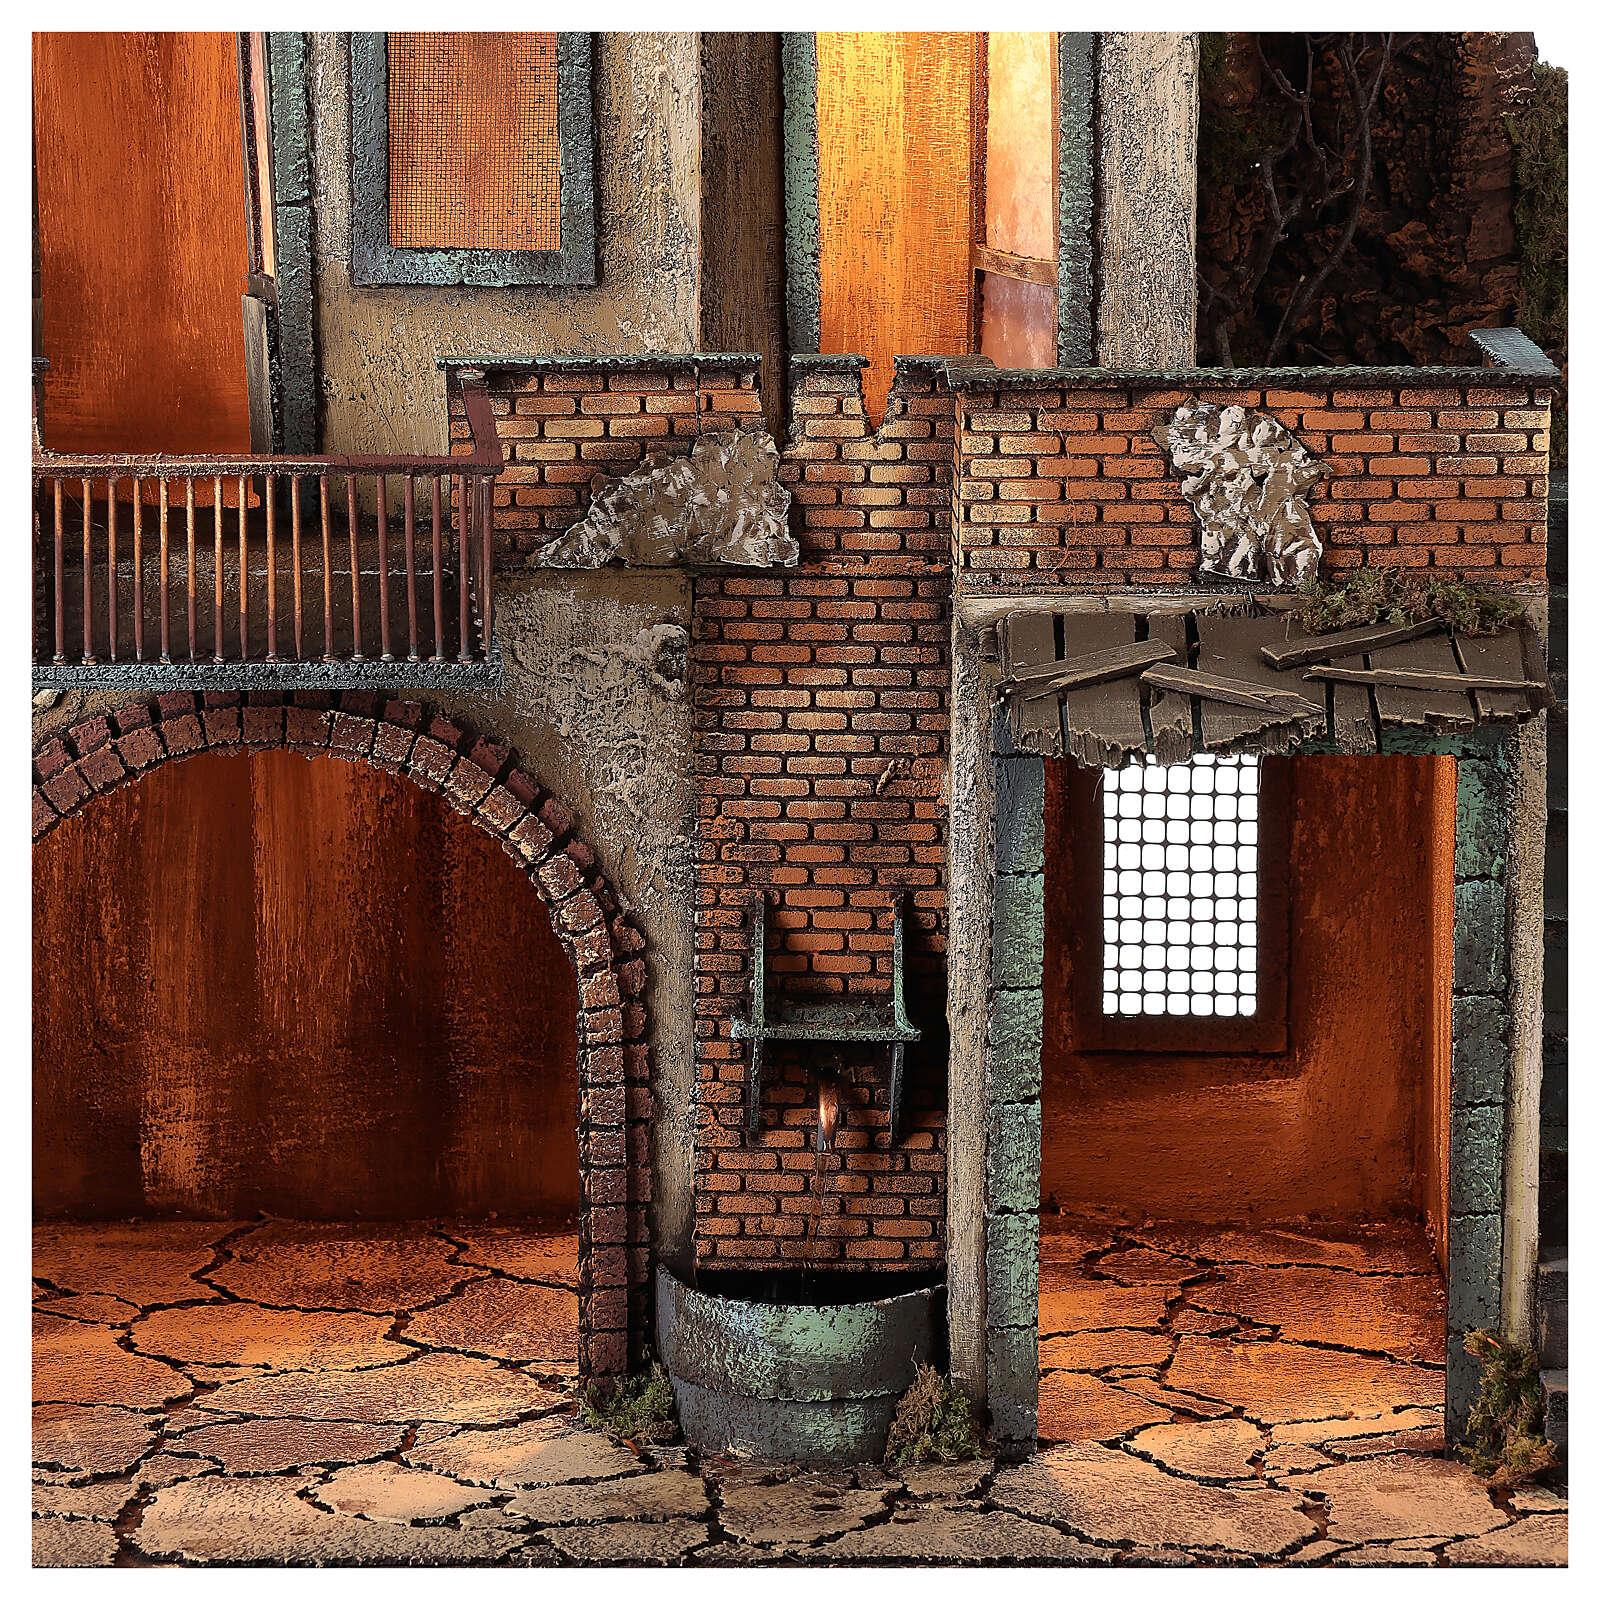 Farmhouse with balcony and electric fountain 80x70x50 cm for Neapolitan Nativity Scene with 14 cm figurines 4